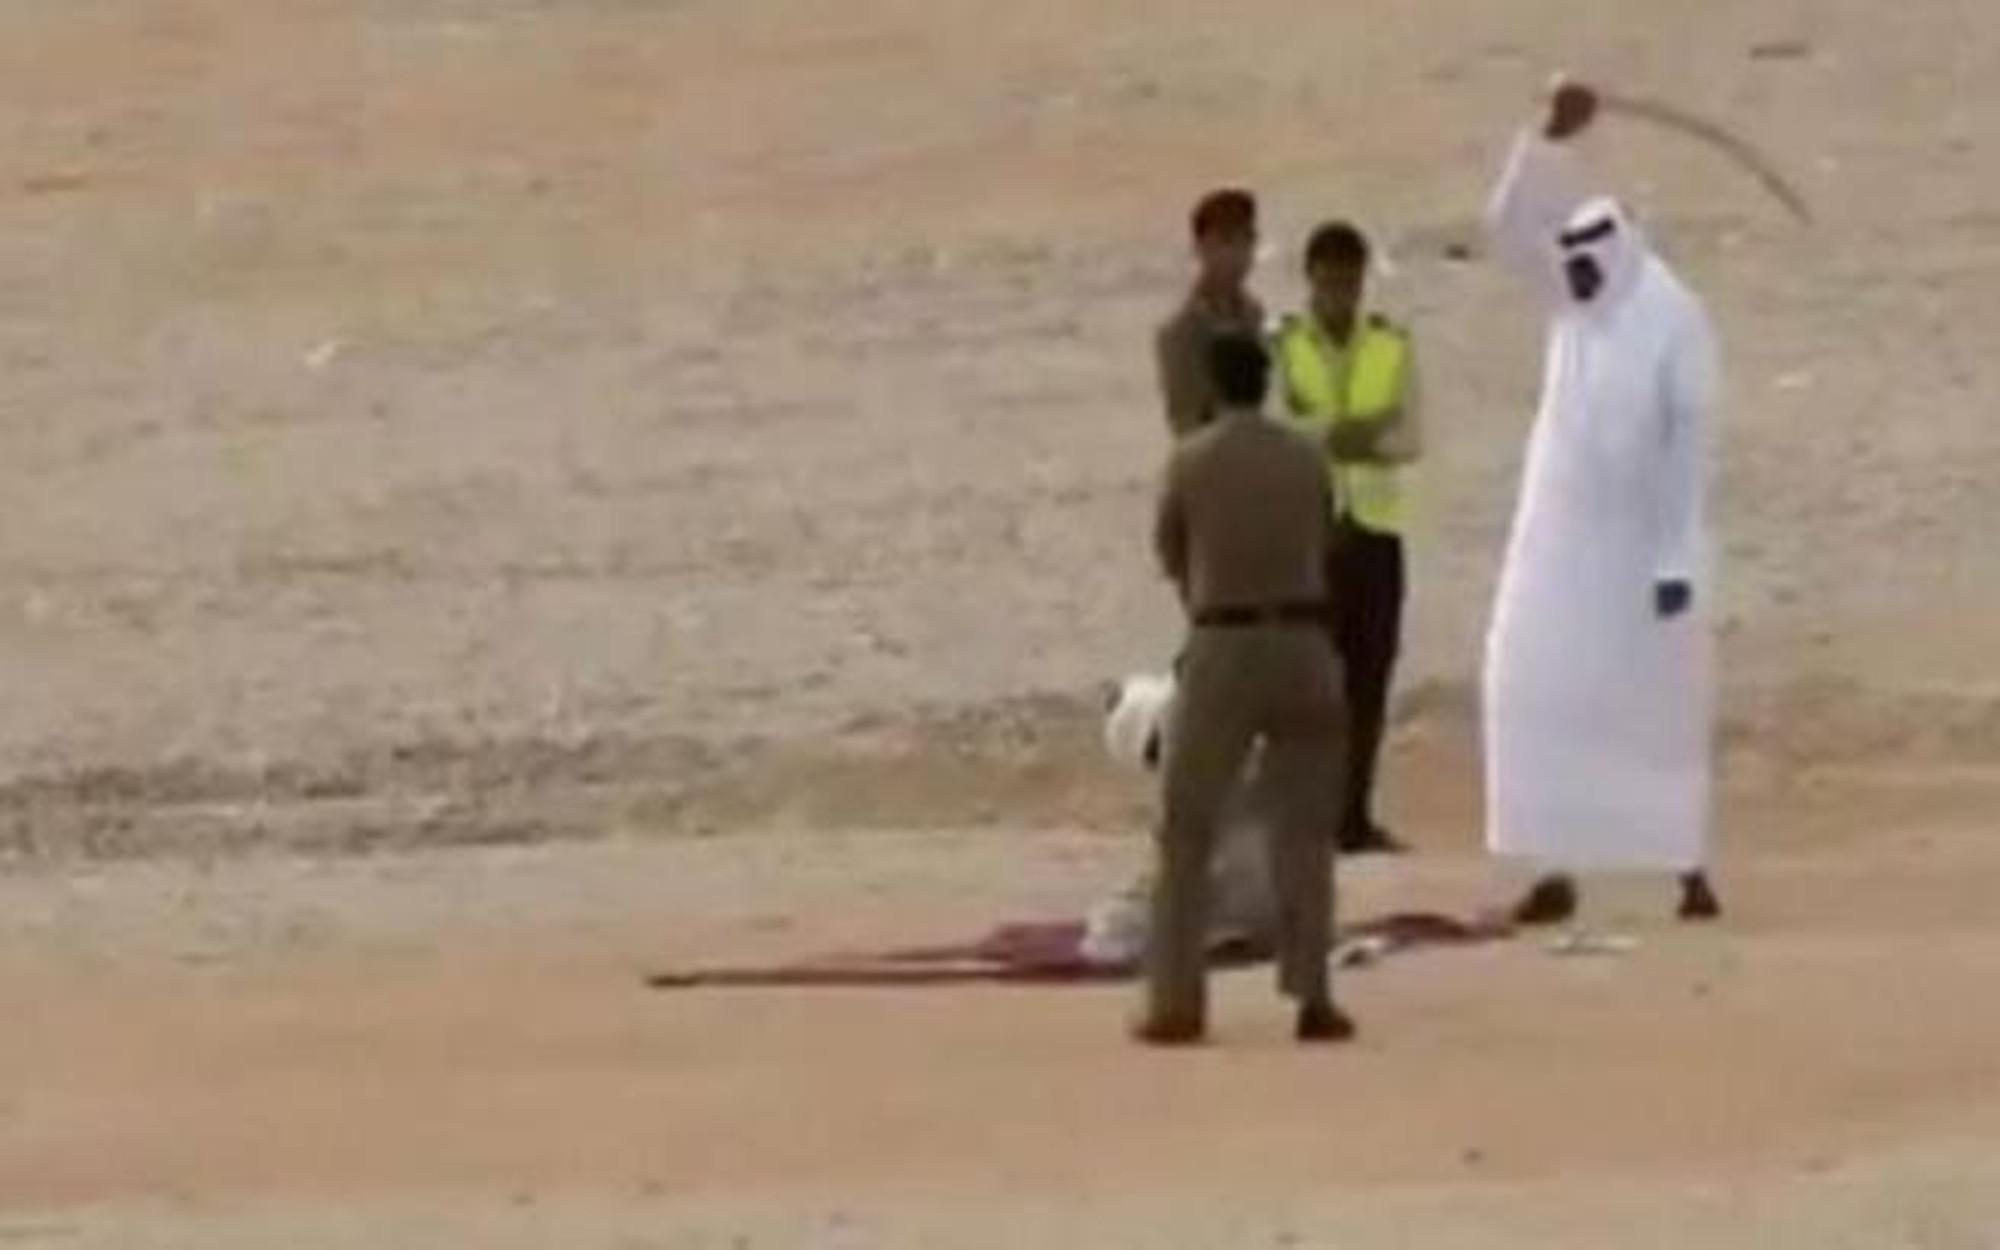 aspekefalismos-prigkipa-riant-1300 Πρίγκιπας εκτελέστηκε στο Ριάντ επειδή δολοφόνησε έναν απλό πολίτη [εικόνα]